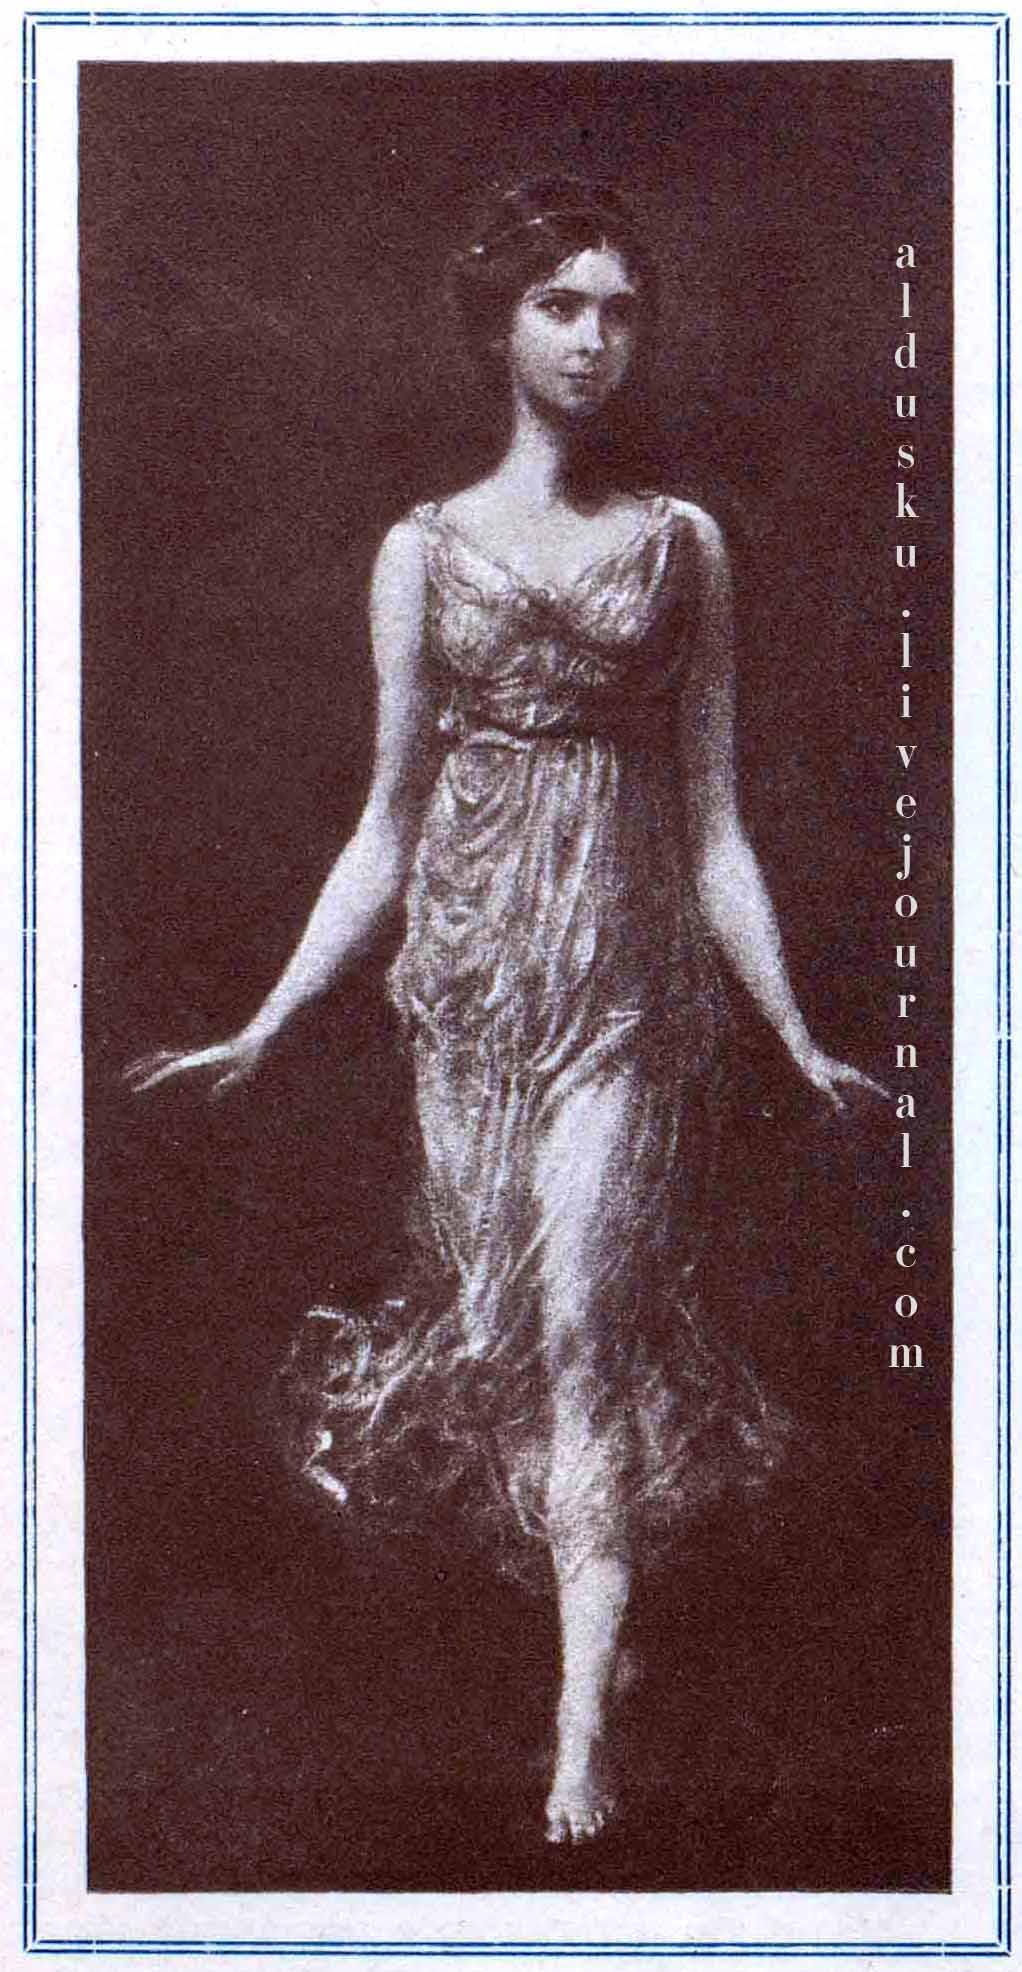 Дункан А. Илл. из 4 тома